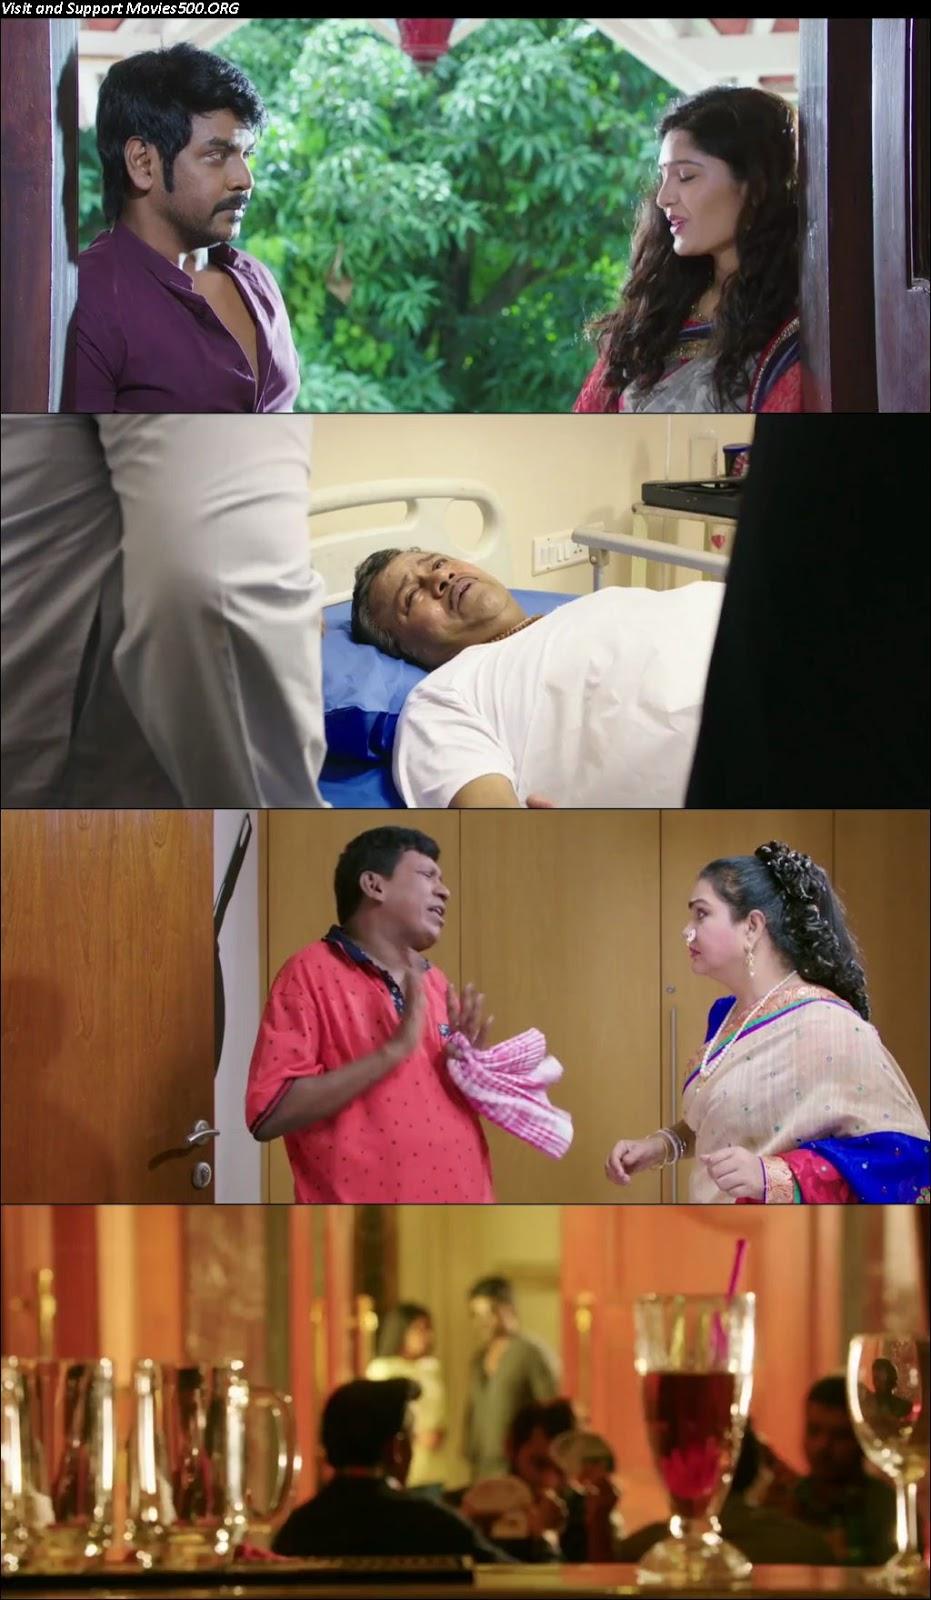 Sivalinga 2017 Dual Audio Hindi Download HDRip 720p ESubs at xcharge.net